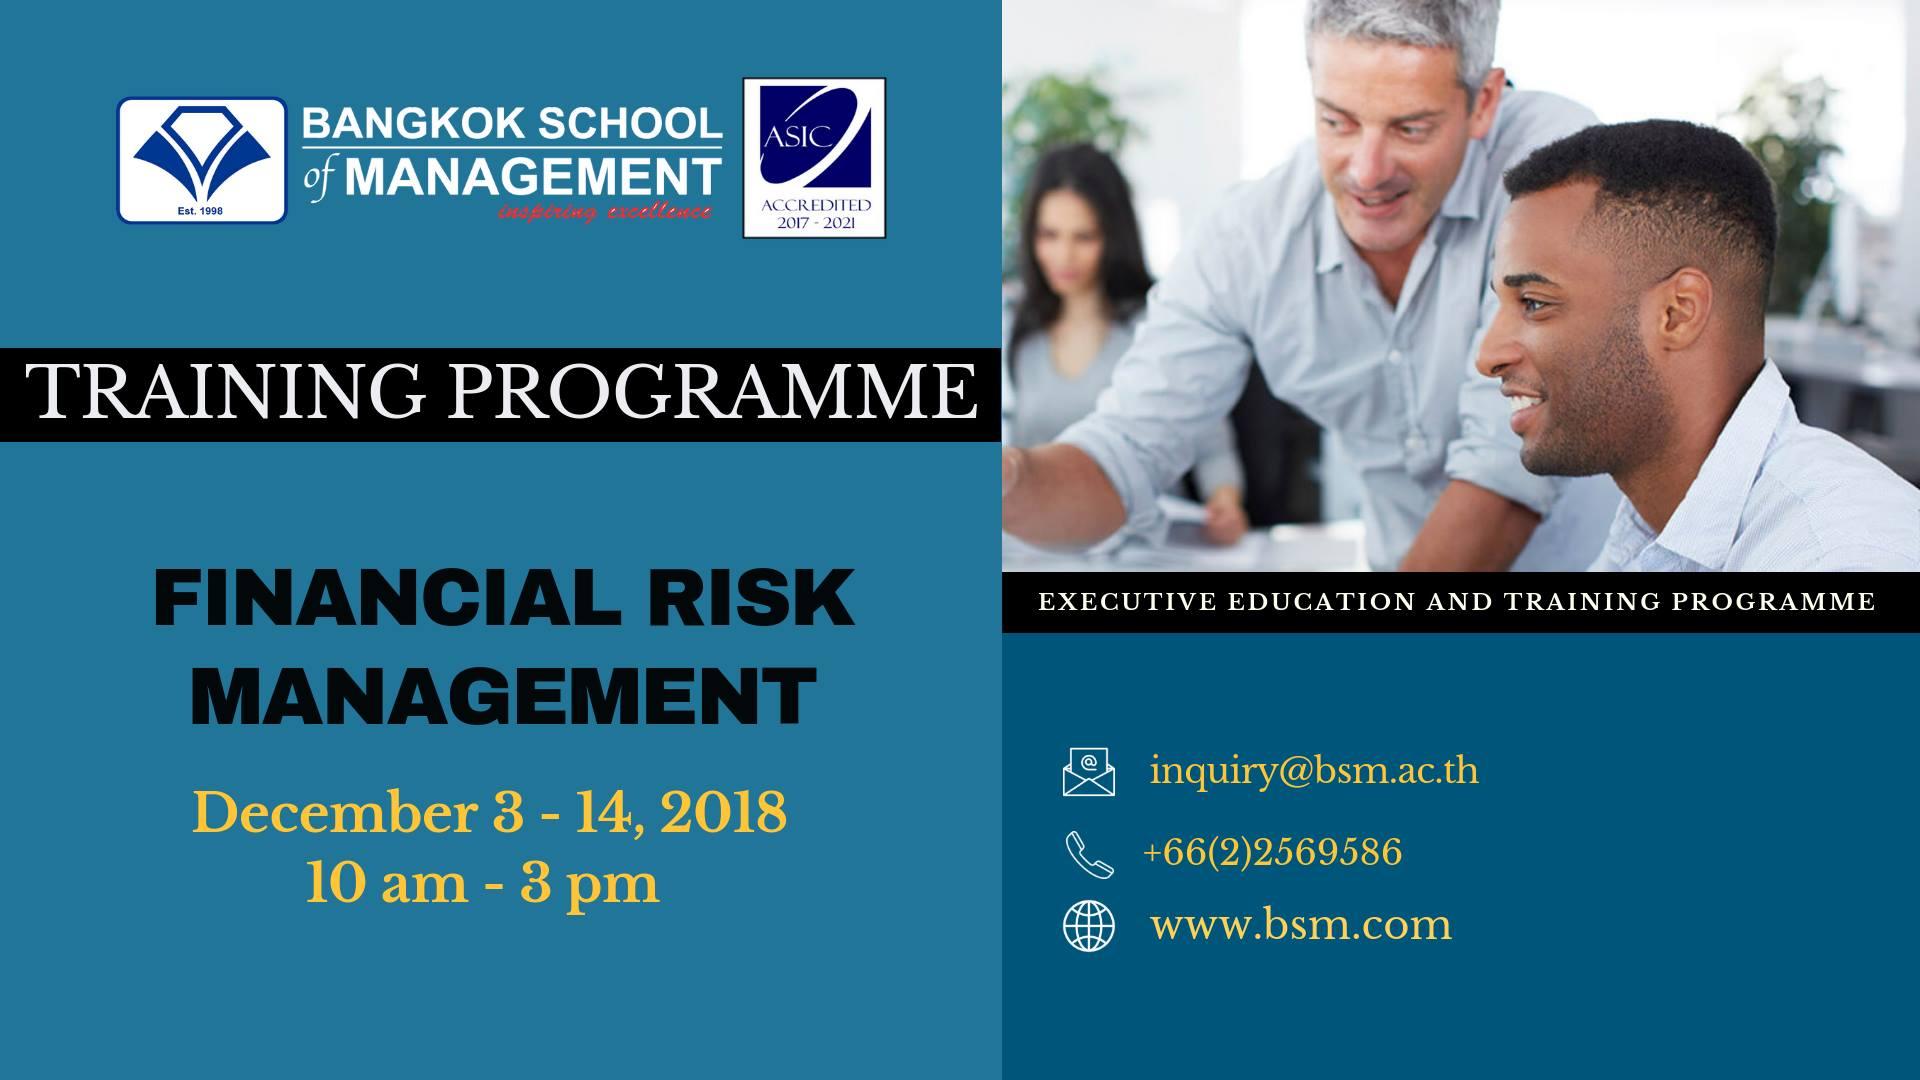 Bsm Bangkok School Of Management